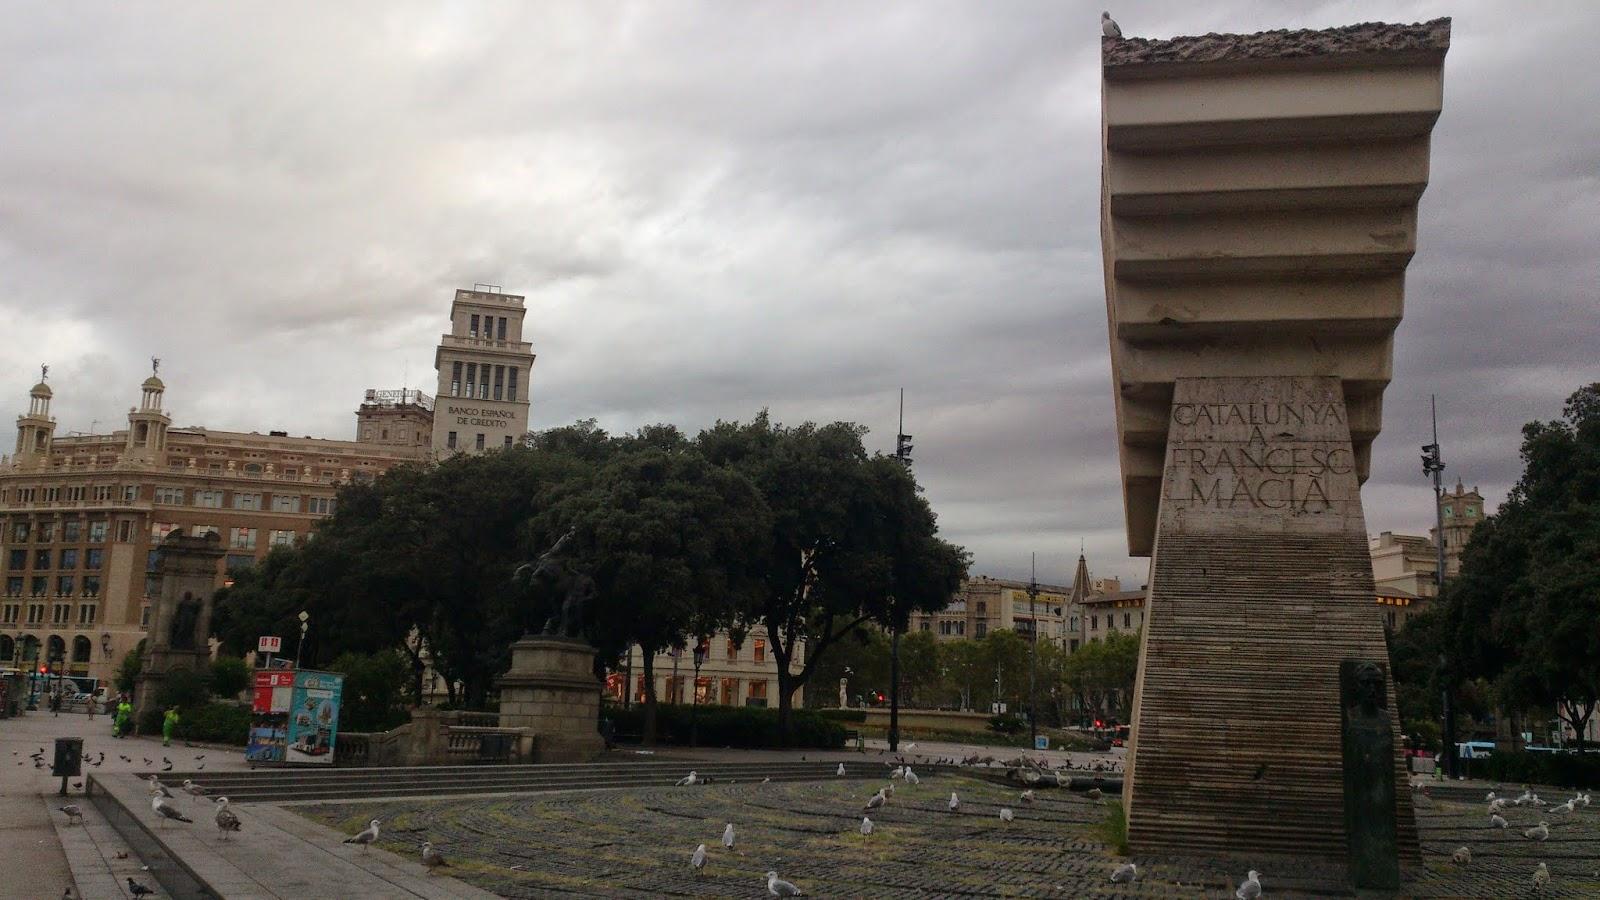 Monumento a Francesc Macià, situado en la Plaza Cataluña